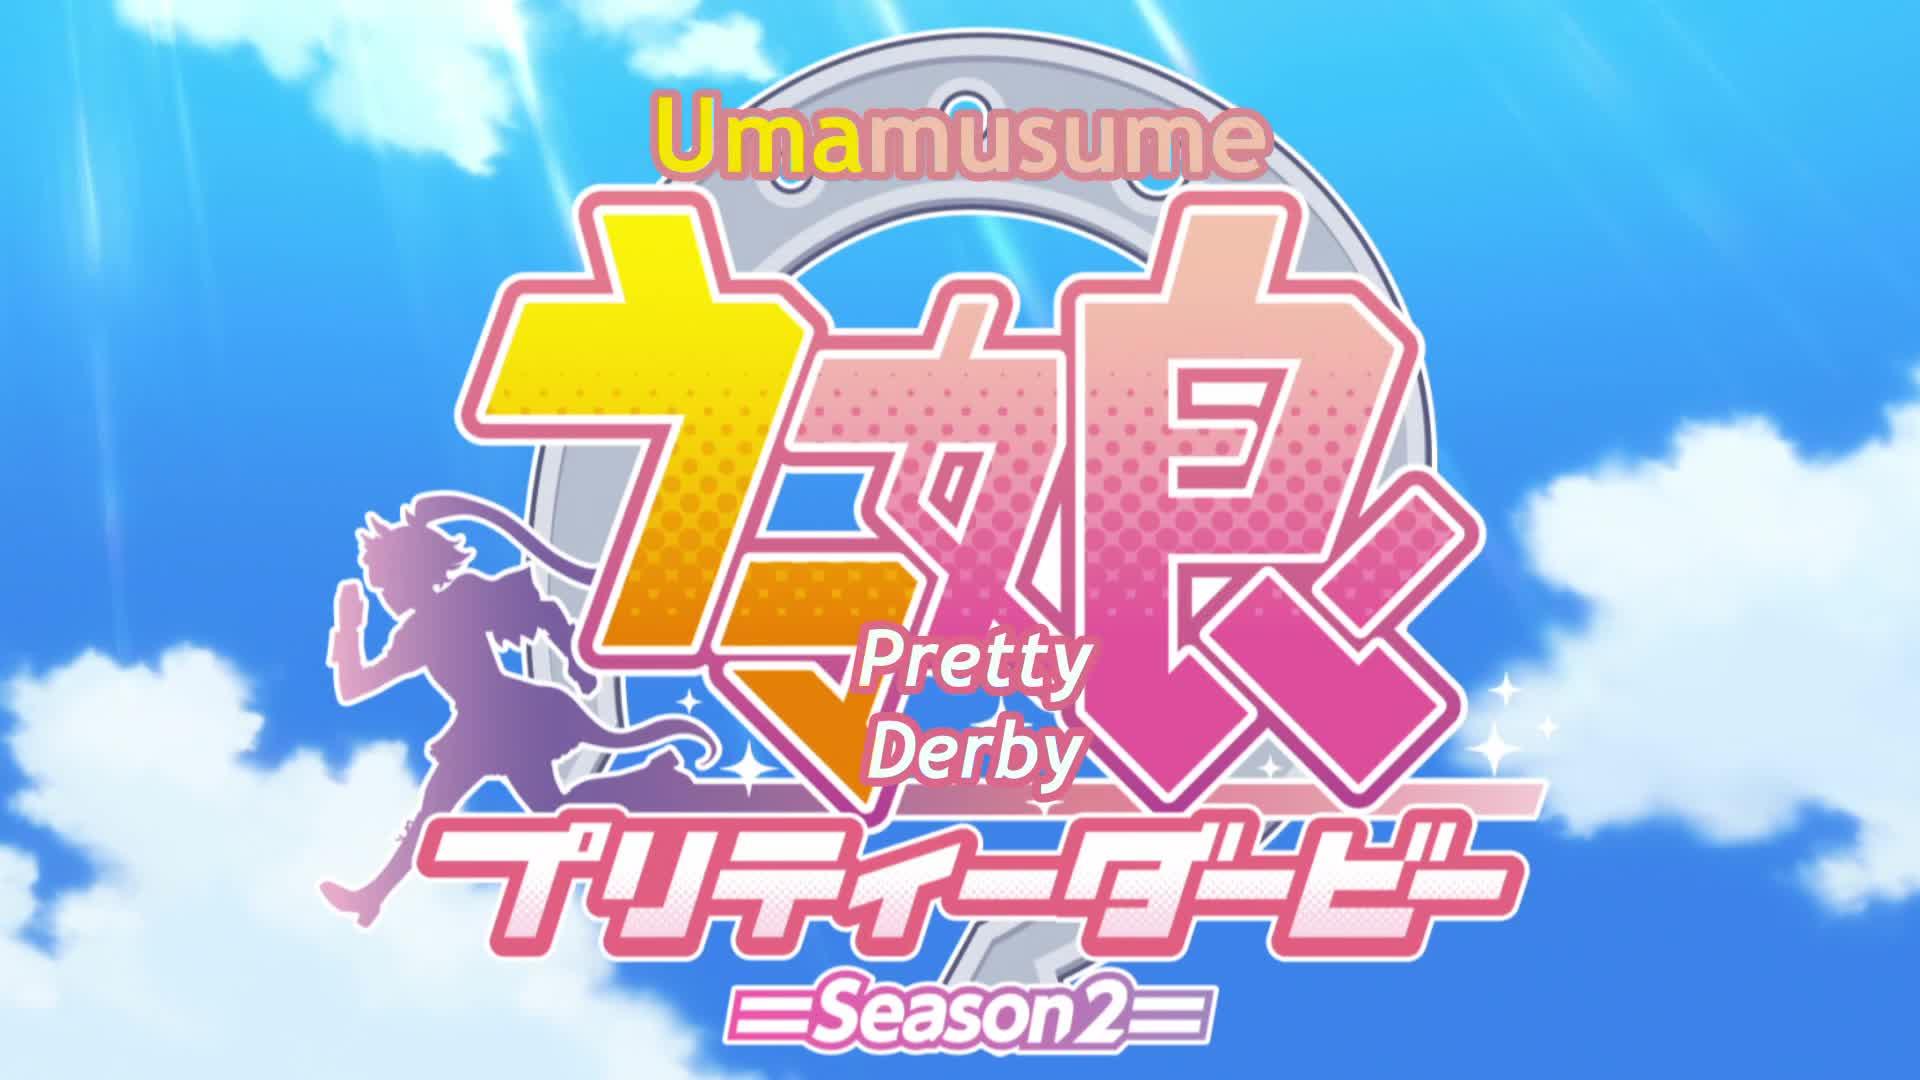 Uma Musume: Pretty Derby Season 2